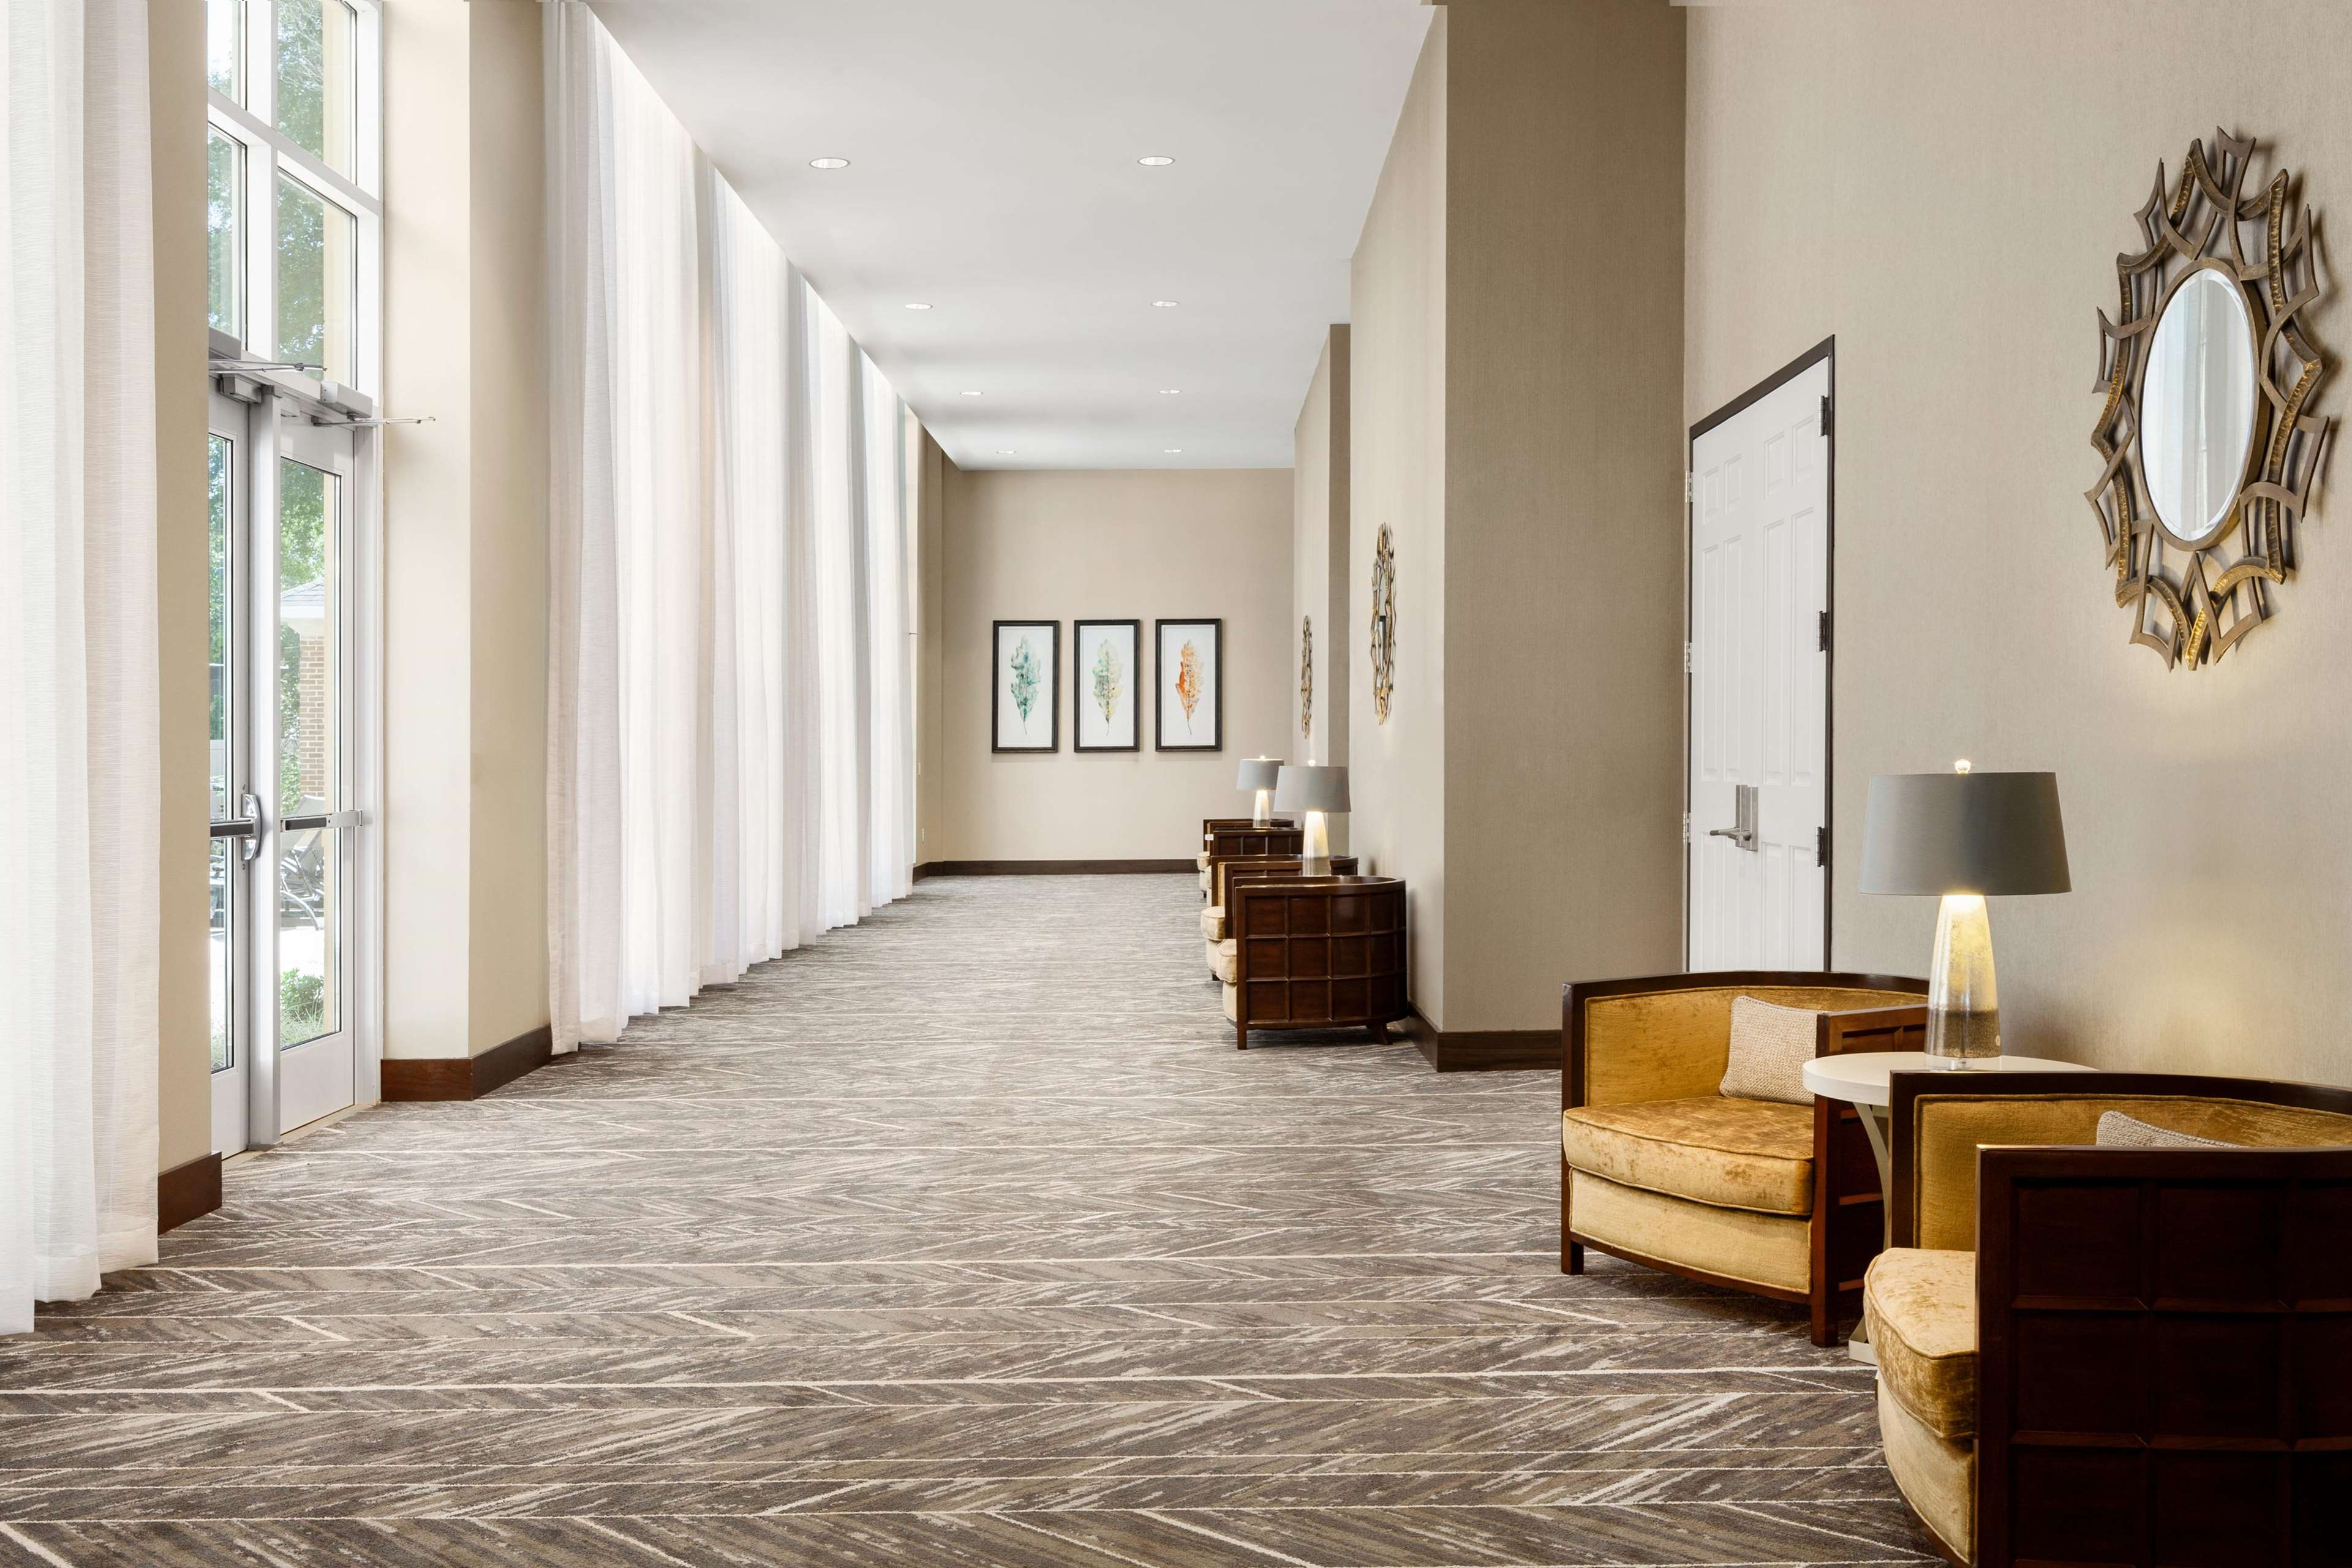 Homewood Suites by Hilton Charlotte/SouthPark image 6